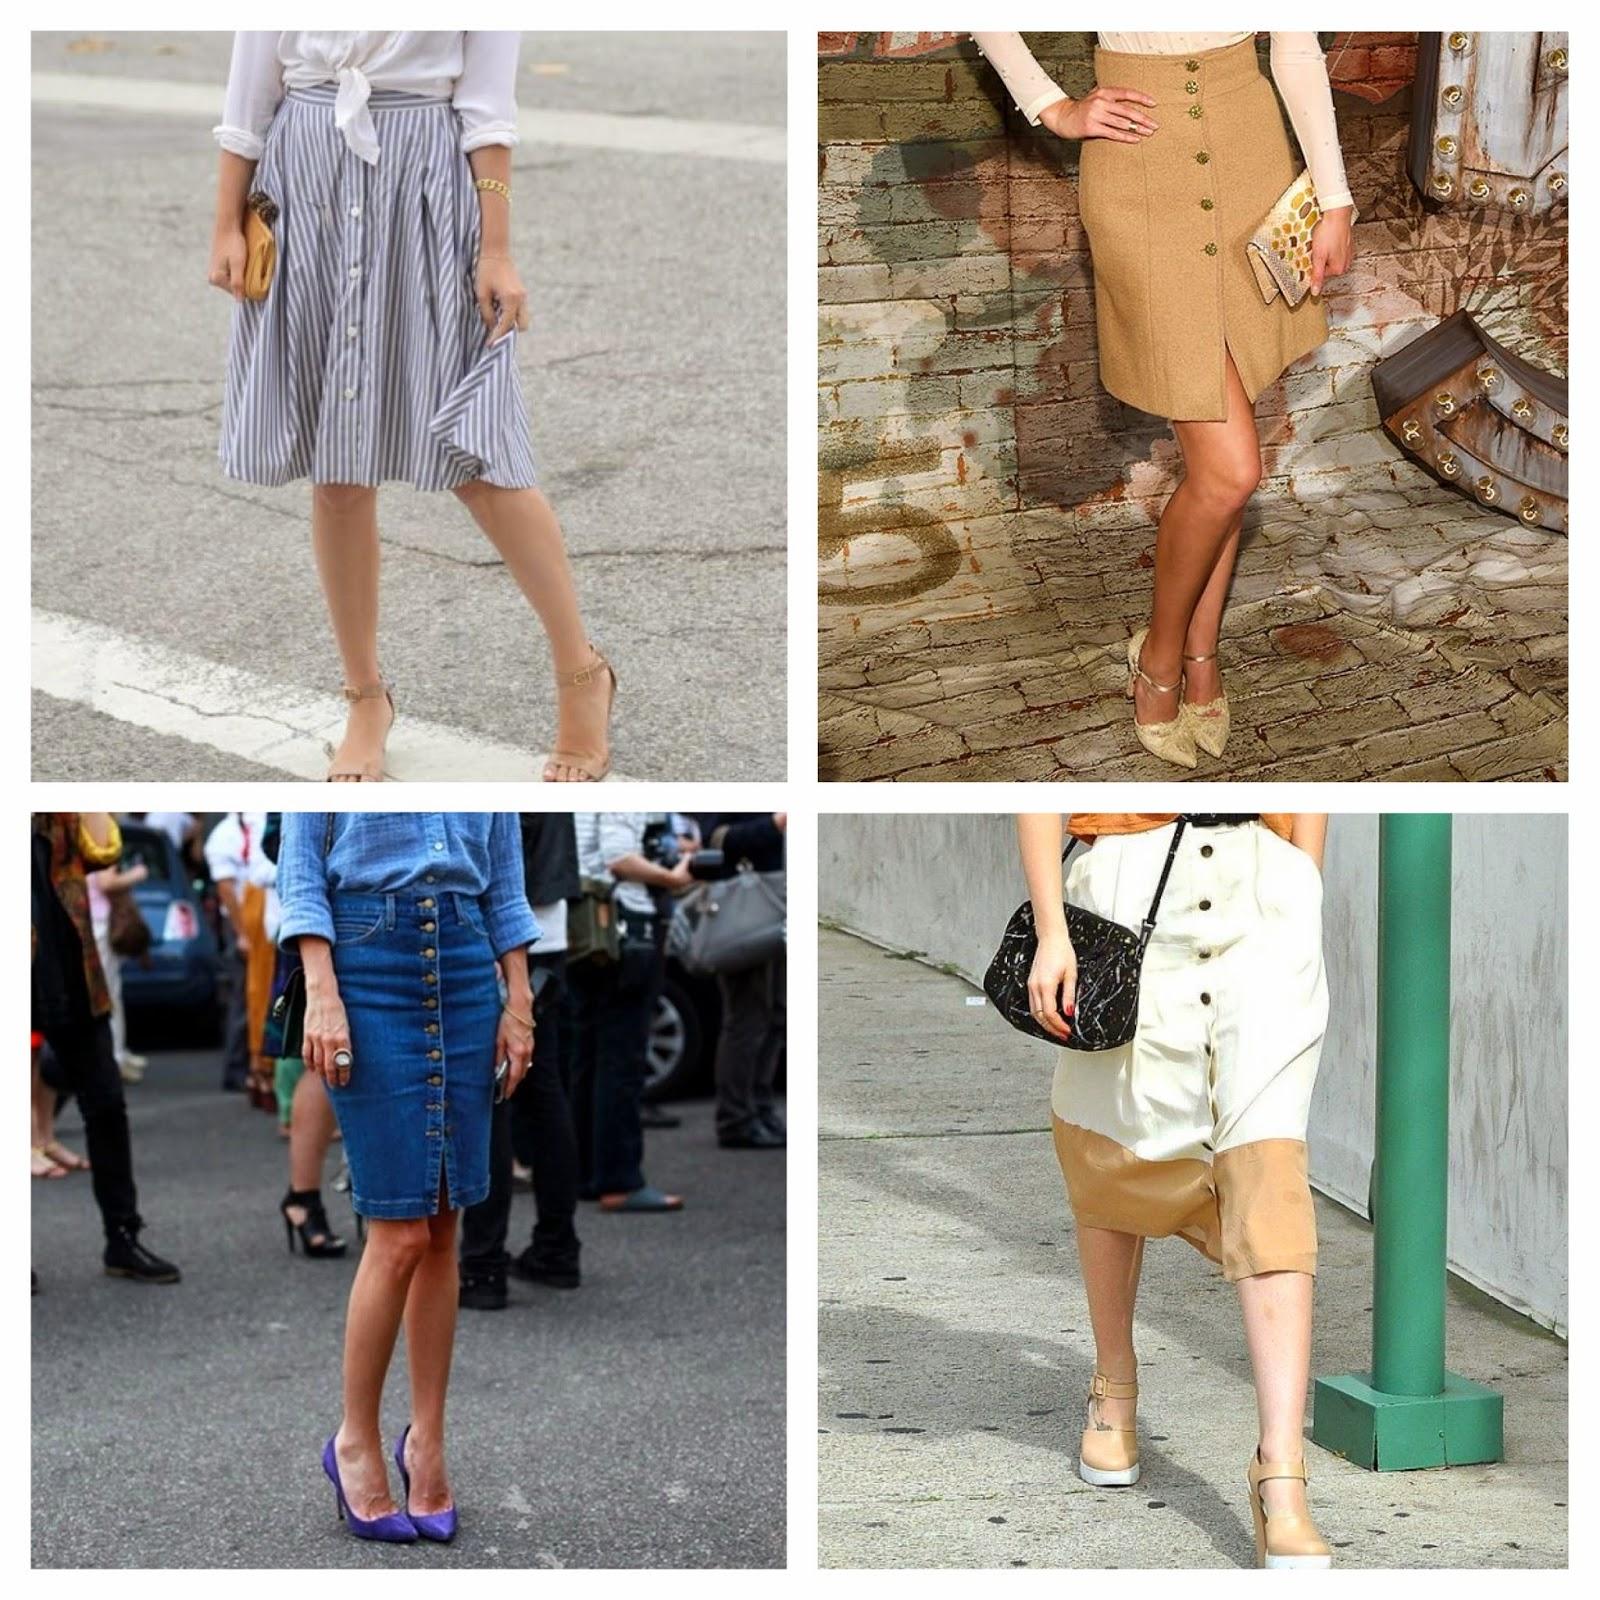 bb2402871d94a New Fashion  Trends in  for SS 2015 2016 موضة الفاشن لصيف وربيع ٢٠١٥ ...